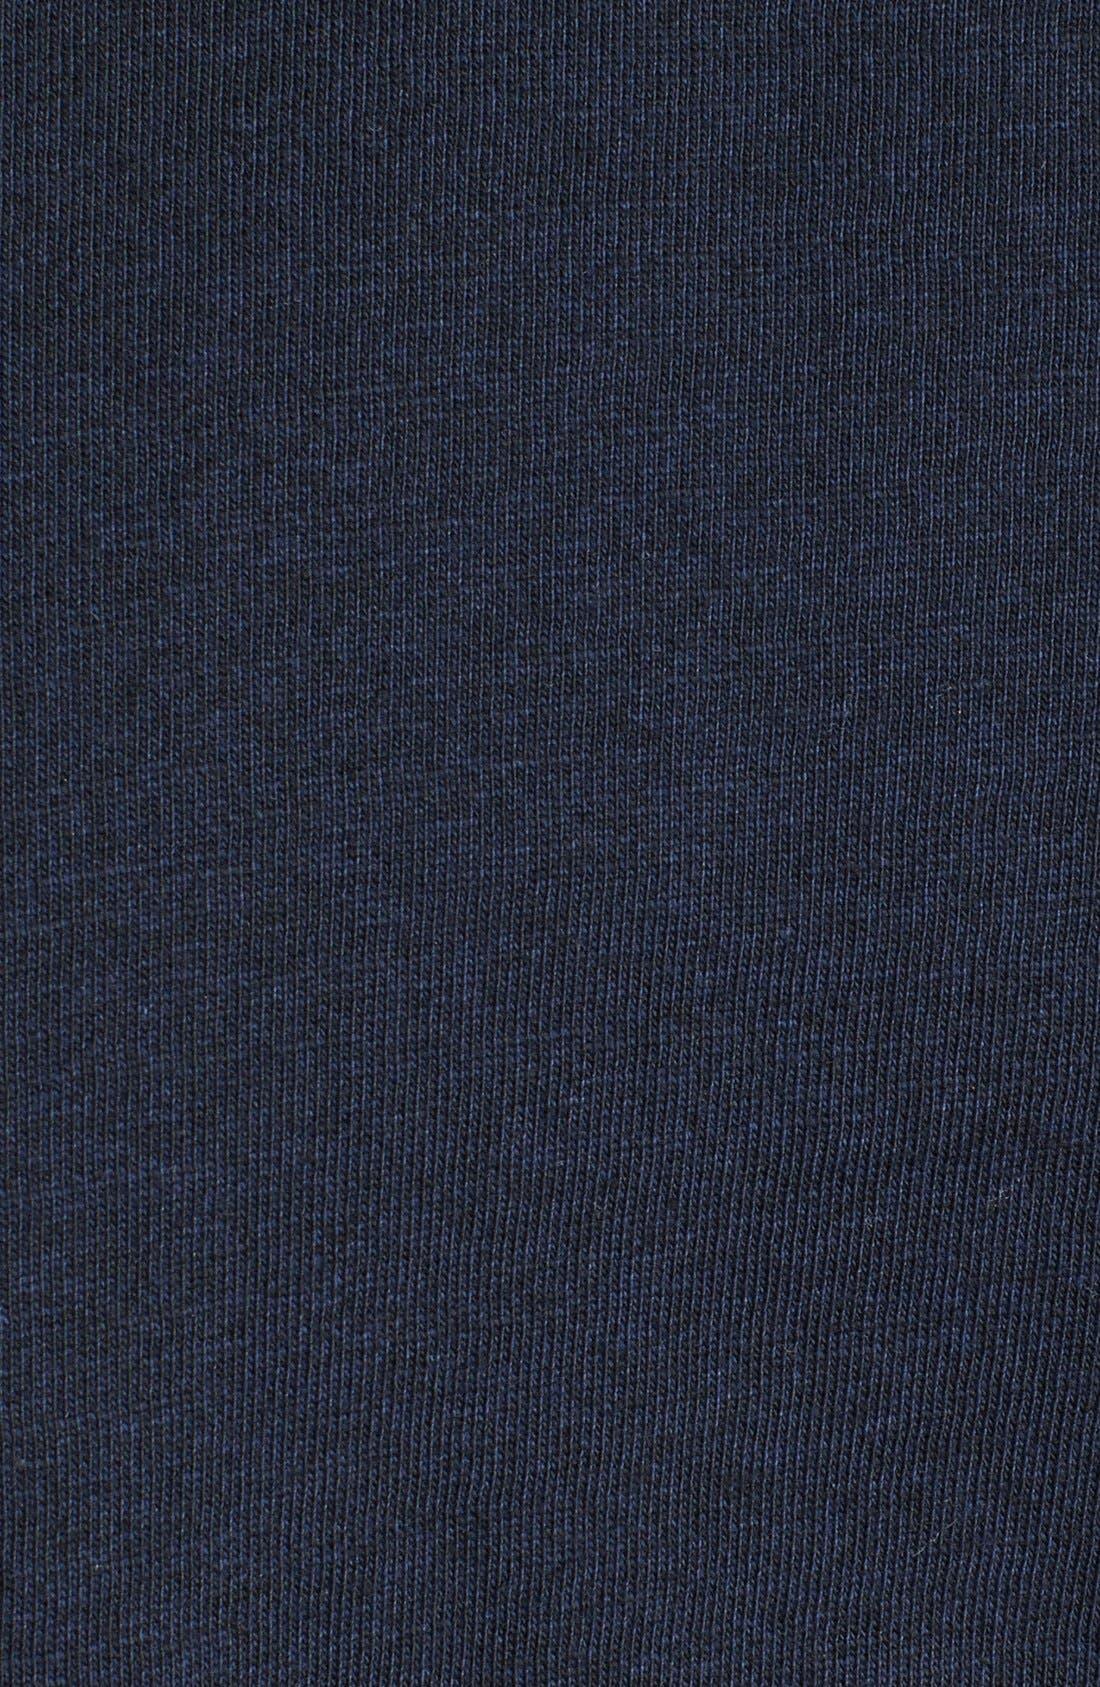 Alternate Image 3  - rag & bone Colorblock Flame Jersey Crewneck Sweatshirt